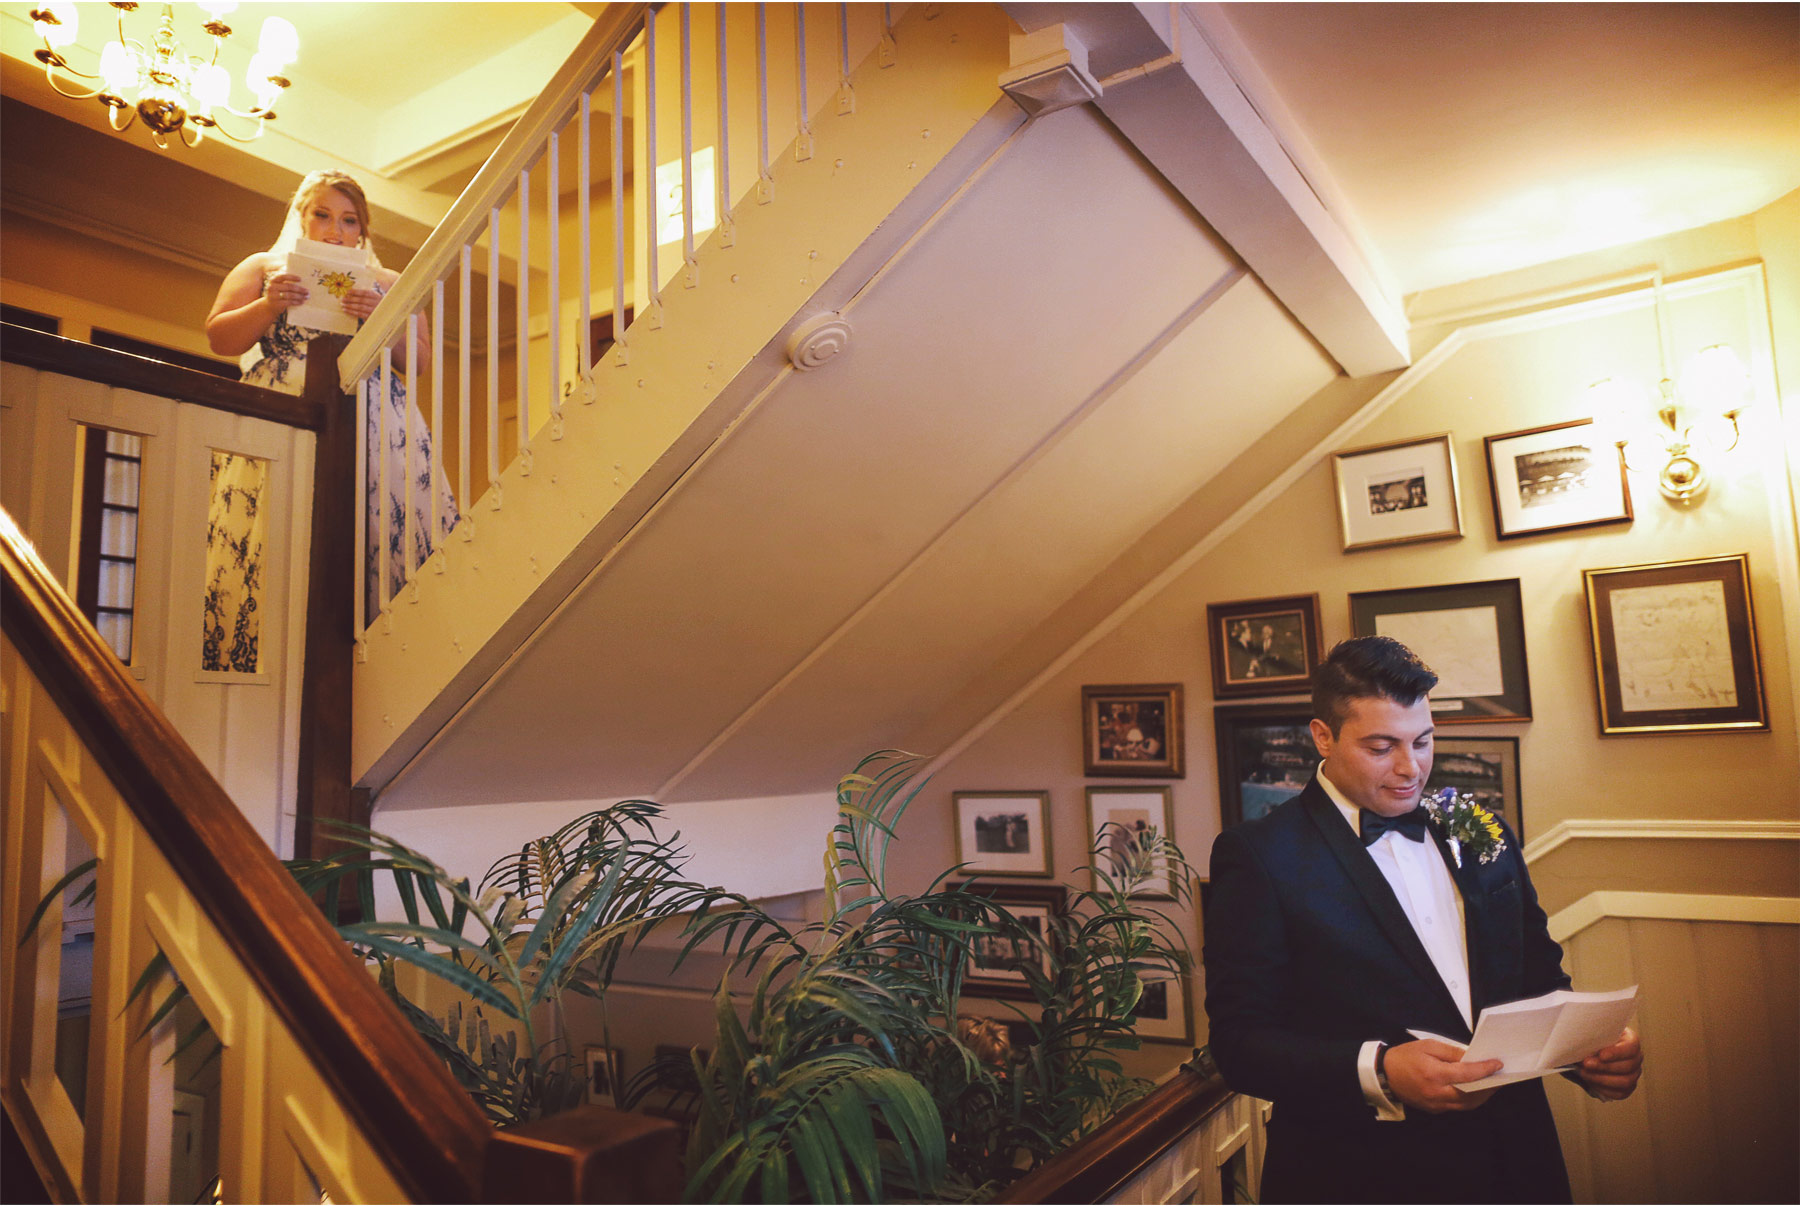 05-Saint-Paul-Minnesota-Wedding-Photography-by-Vick-Photography-The-University-Club-Bride-and-Groom-Letter-Exchange-Mari-and-Giuseppe.jpg